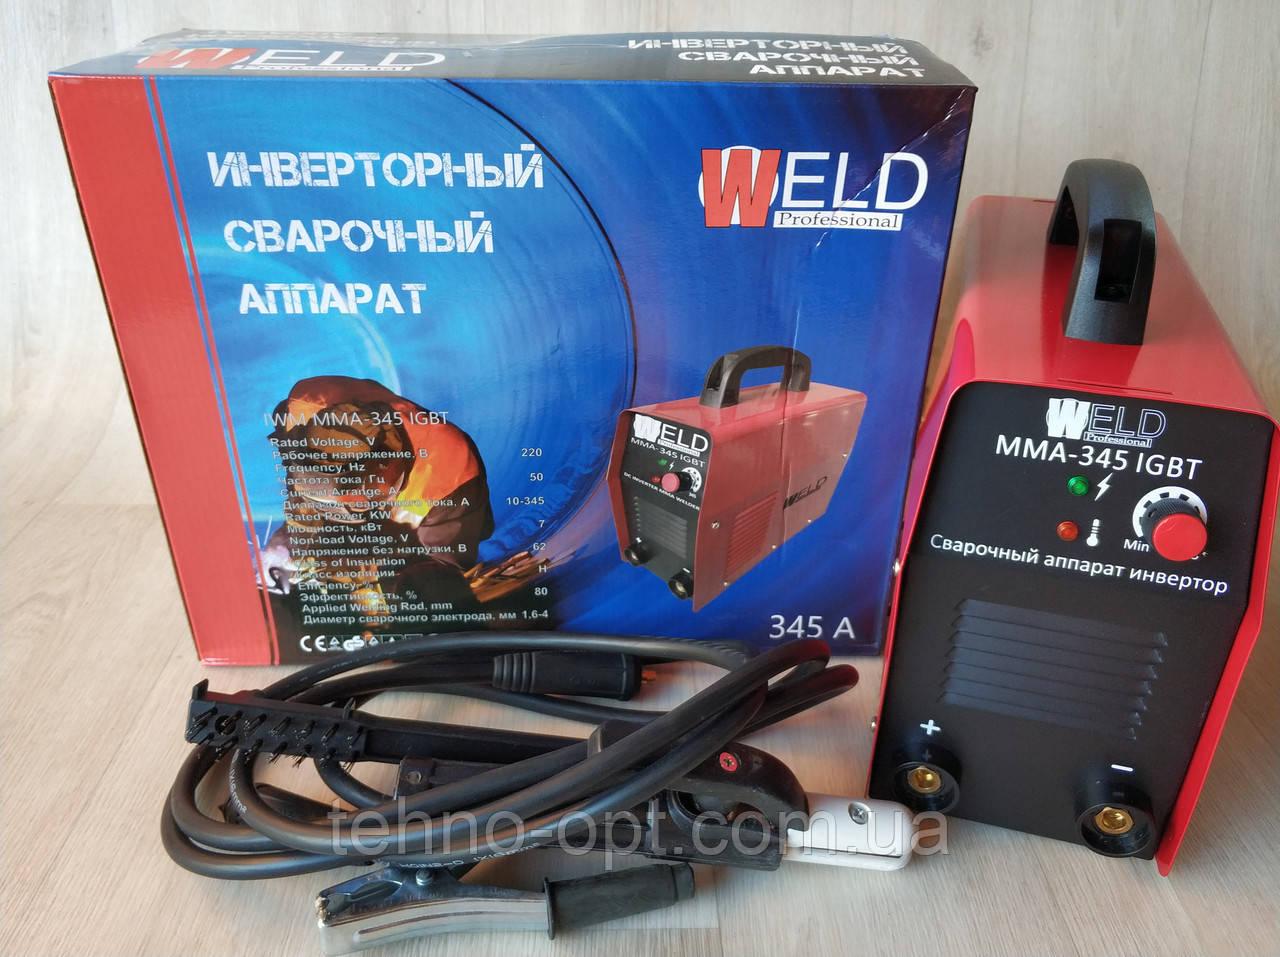 Сварочный аппарат Weld 345